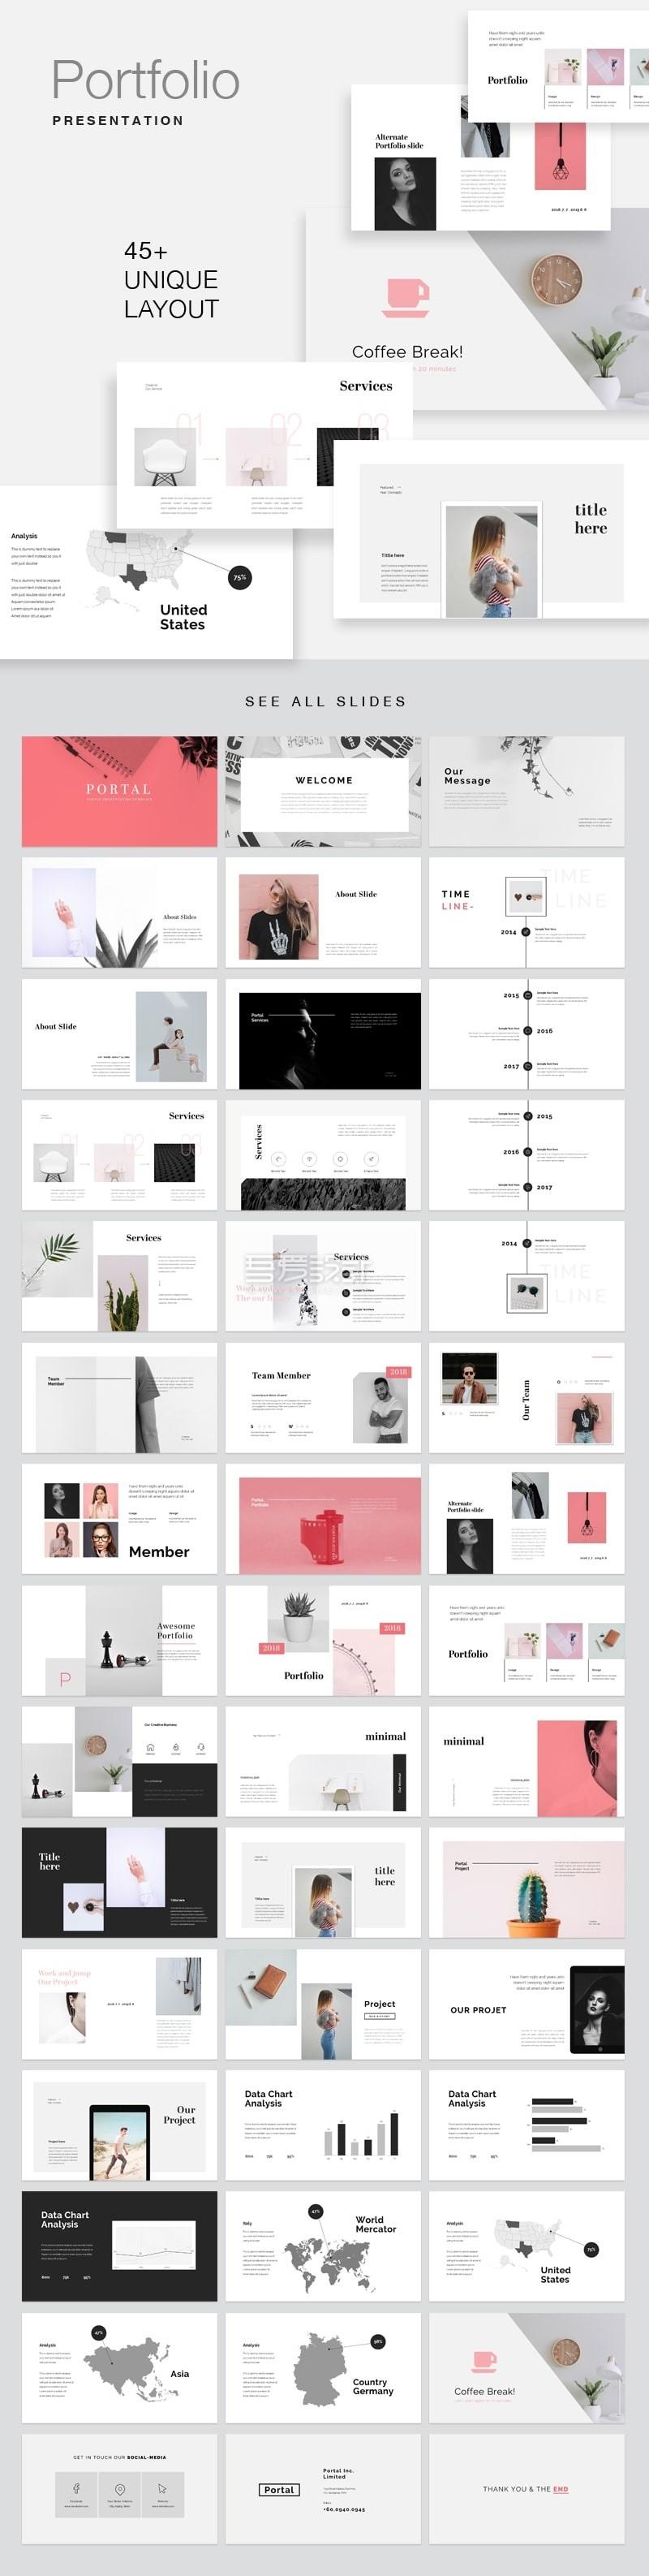 portal-portfolio-powerpoint-16023-preview_a12